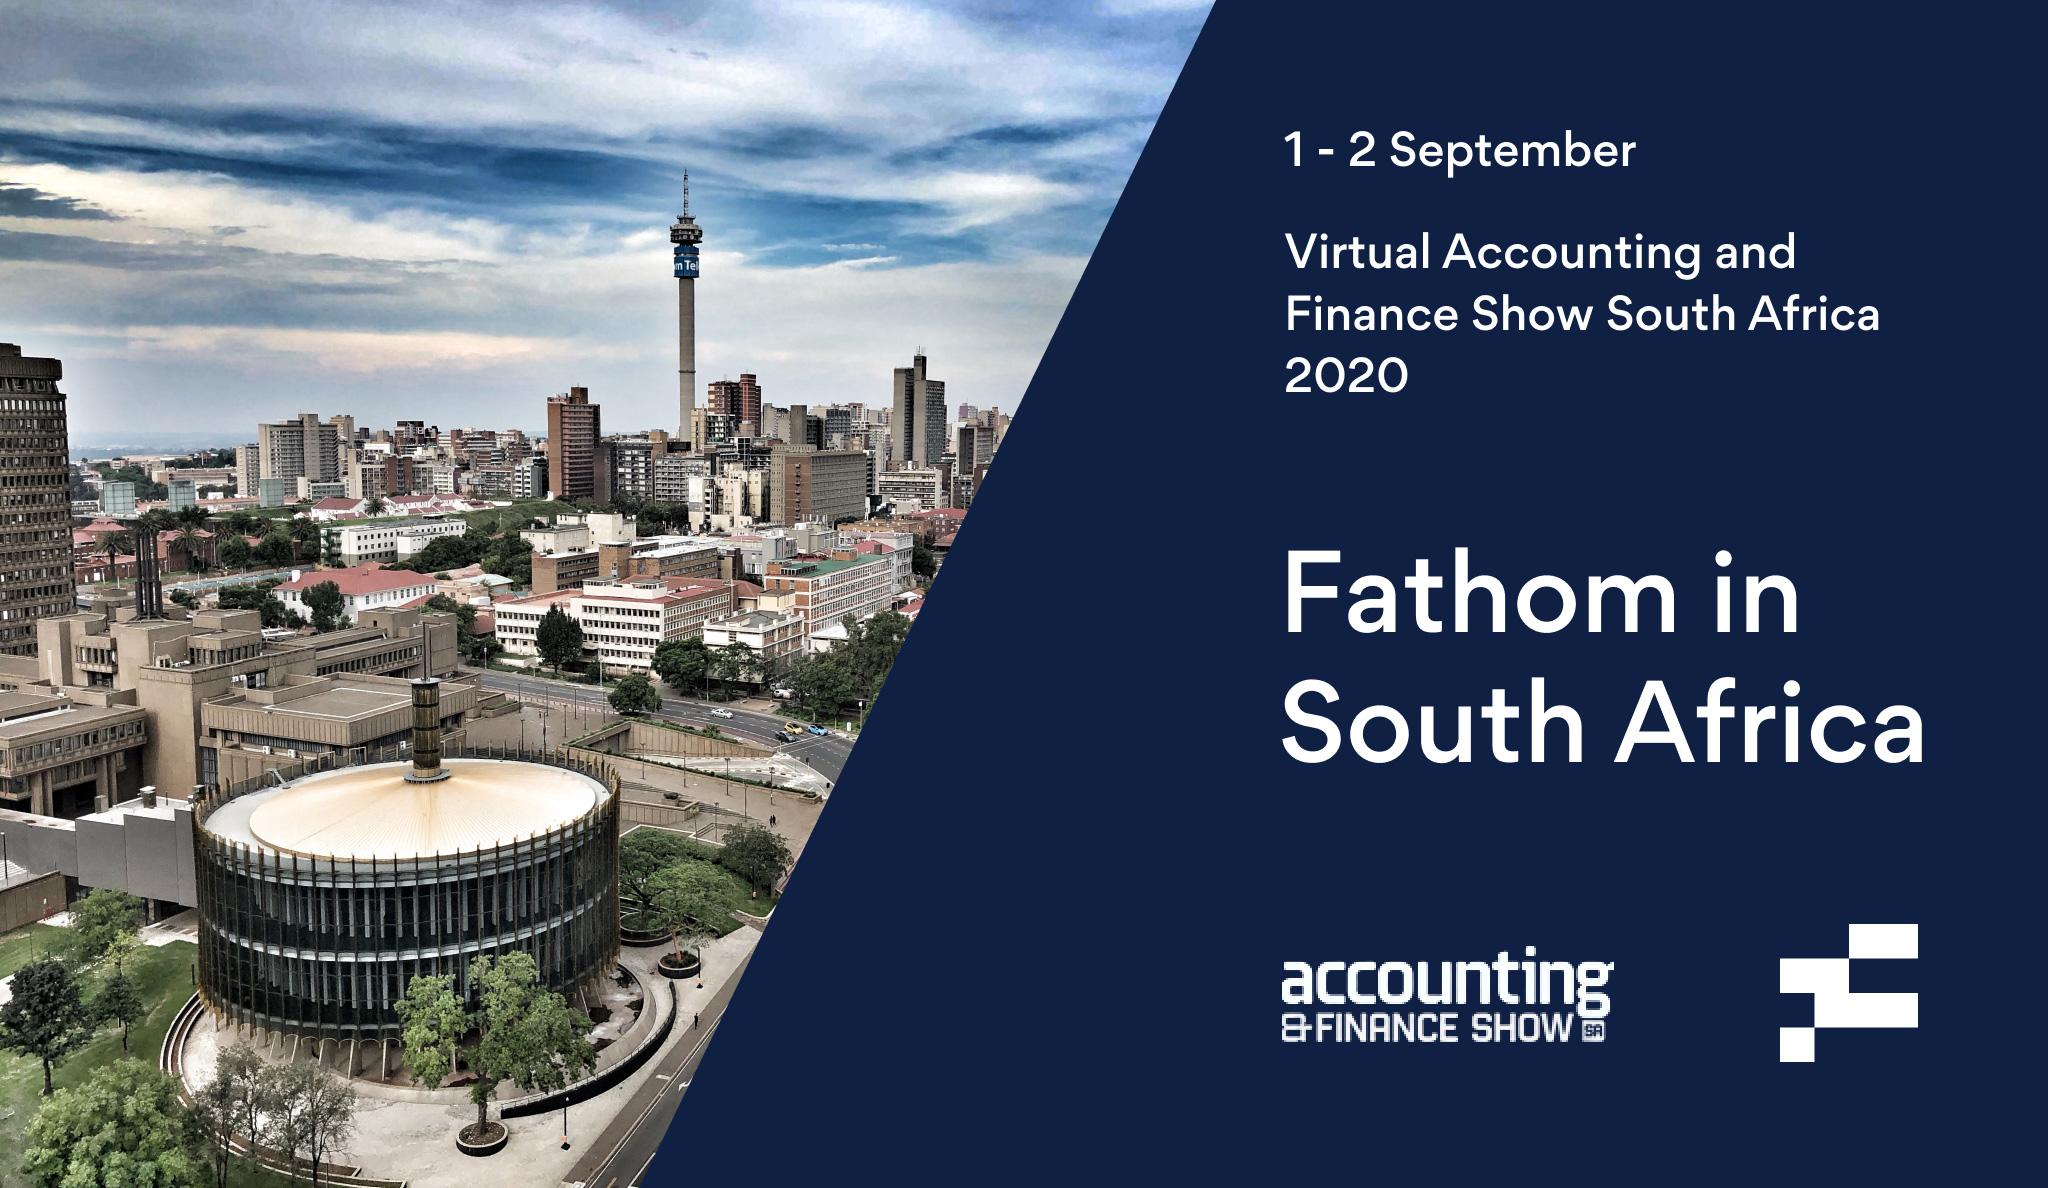 Fathom in South Africa